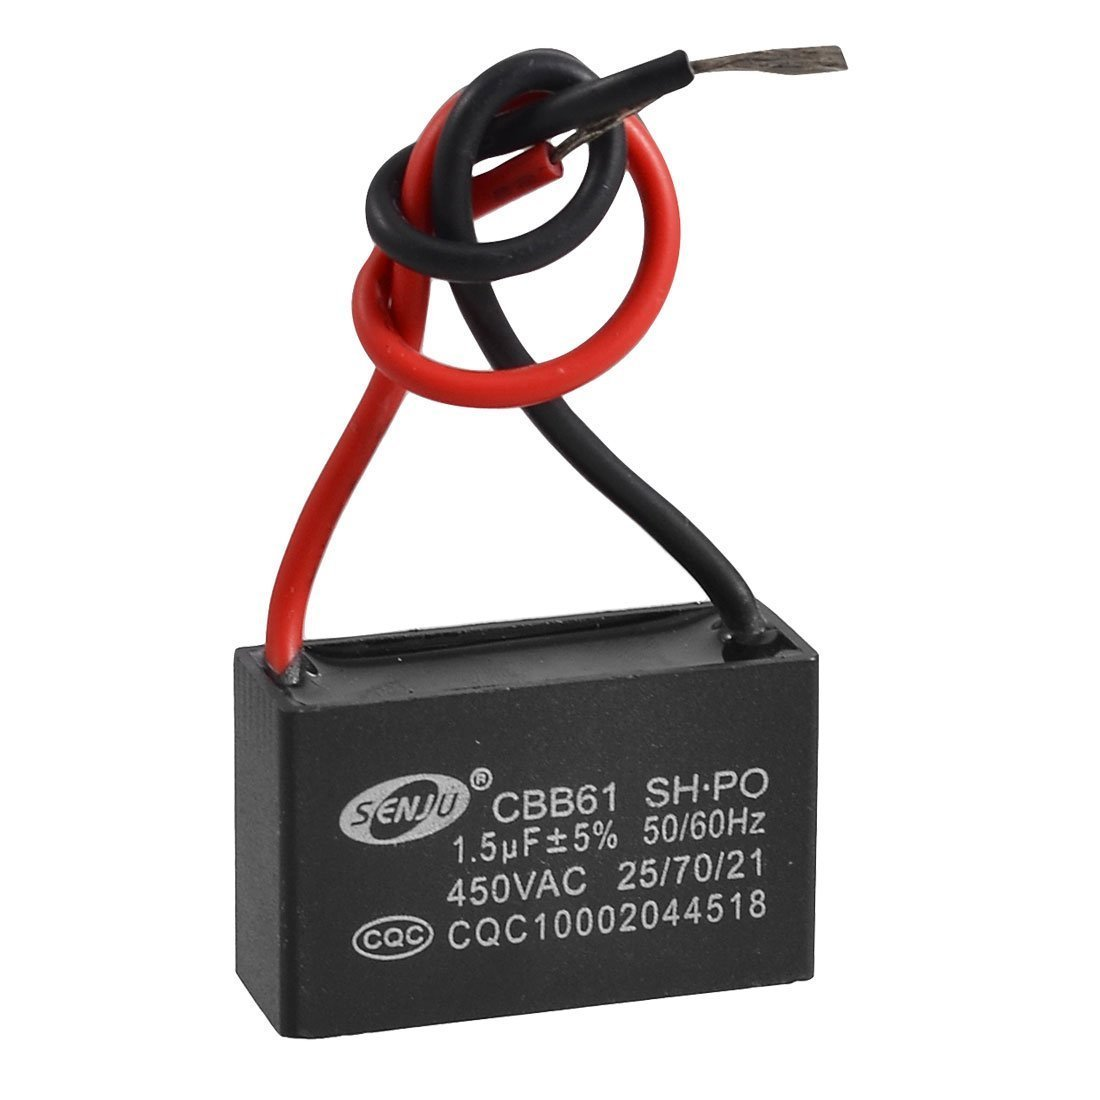 CBB61 AC 450V 1.5uF 2-Draht-Anschluss Deckenventilator Motor Run ...